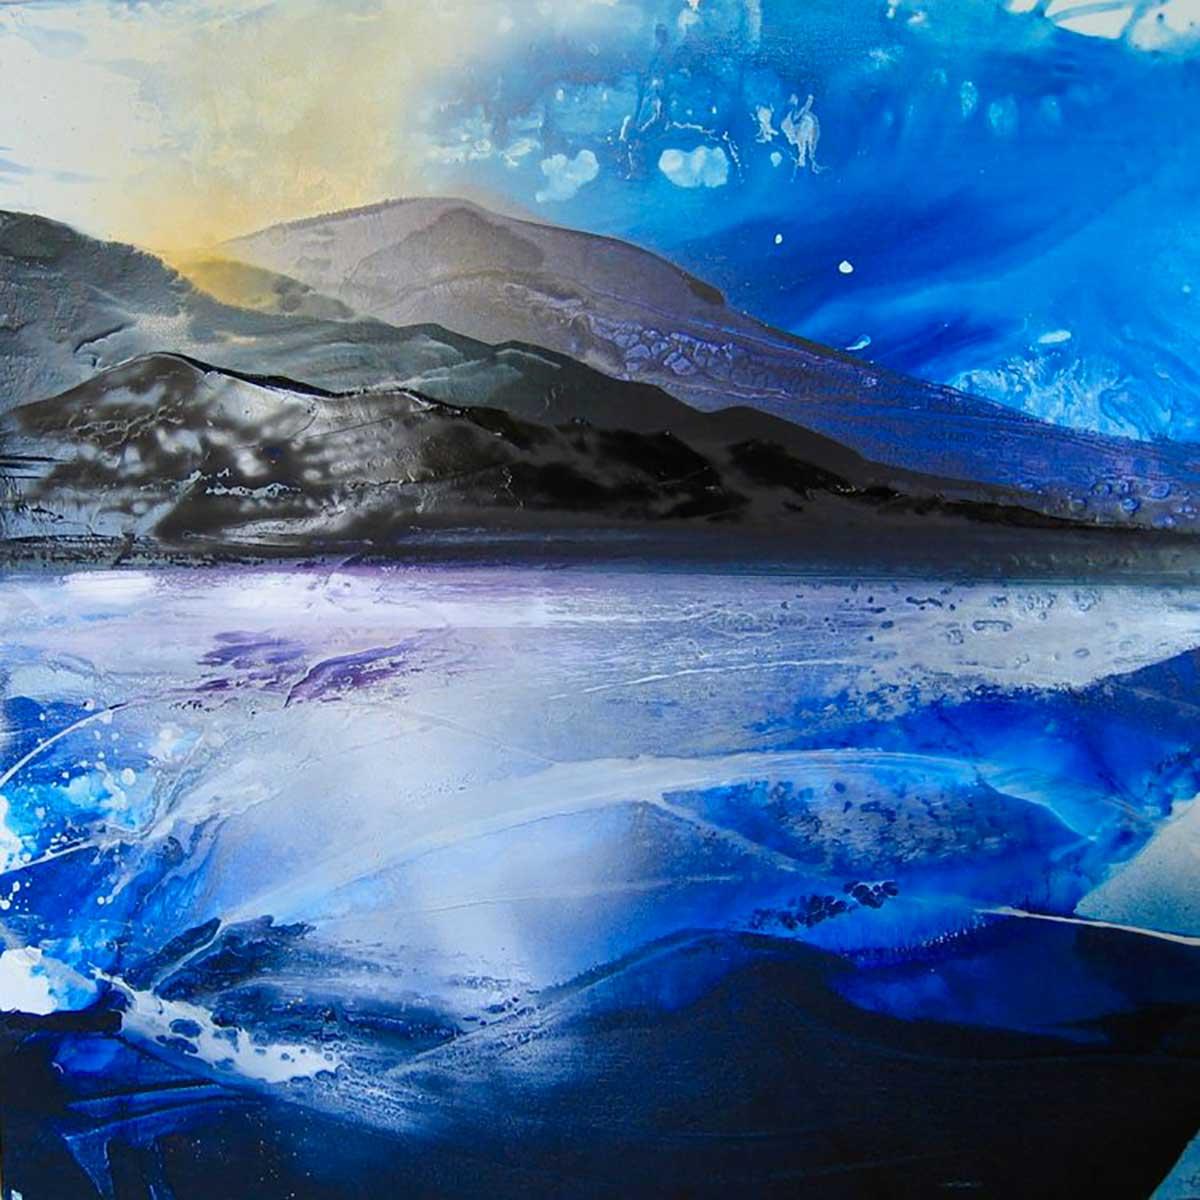 Gallery Heinzel: Winter Exhibition